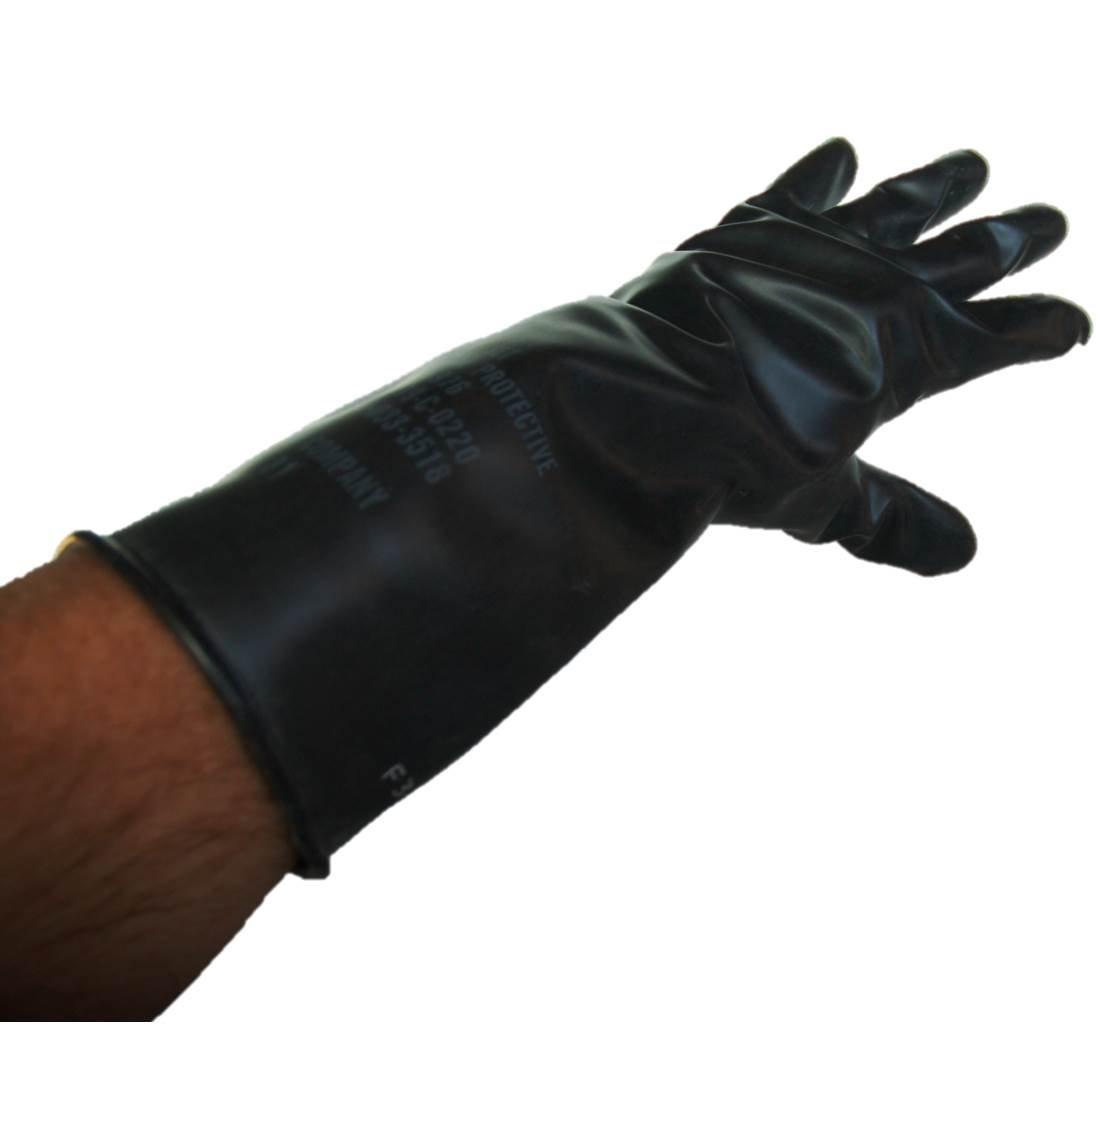 Norton Chemical Resistant 14-Mil Black Butyl Rubber Gloves, Men's Medium, 14.5'', 72-Count